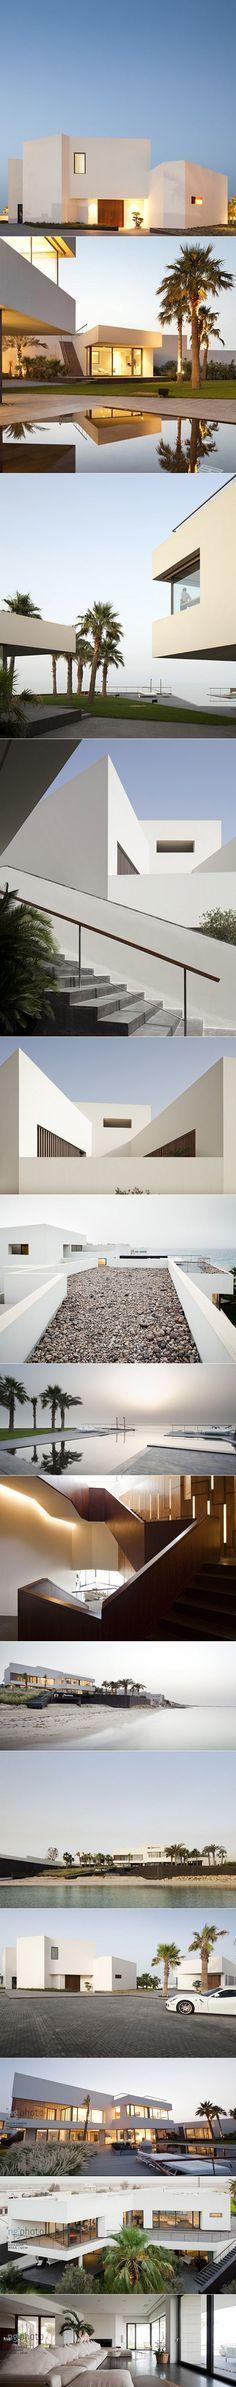 ARCHITECTURE U003eu003eu003e Star House Par AGi Architects